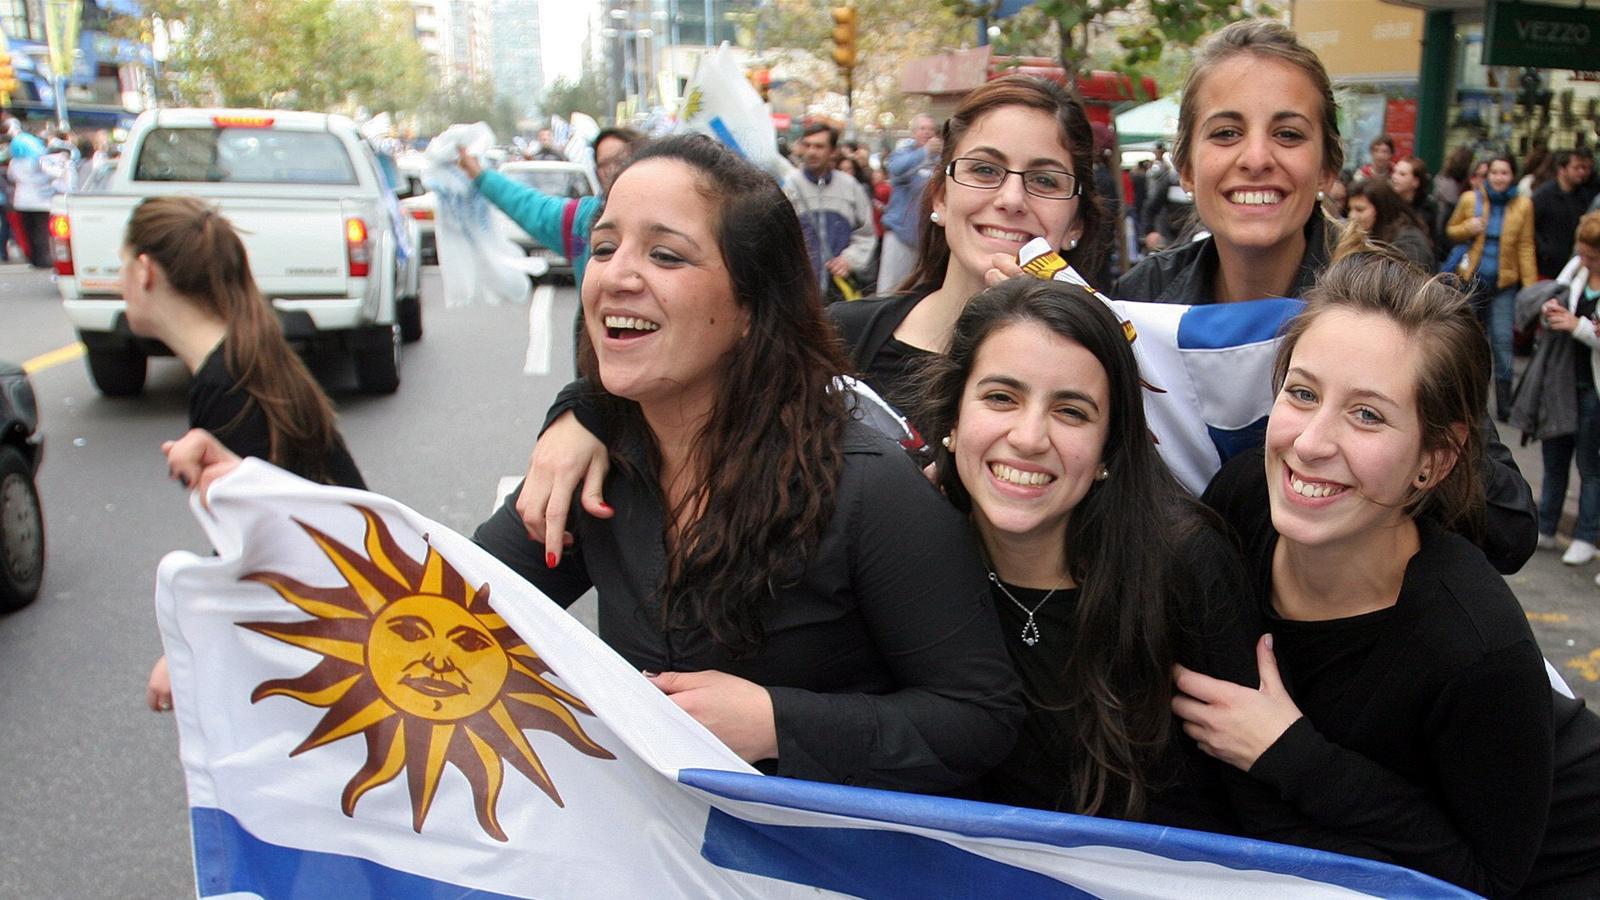 Jubilant Uruguayans party - Copa América 2011